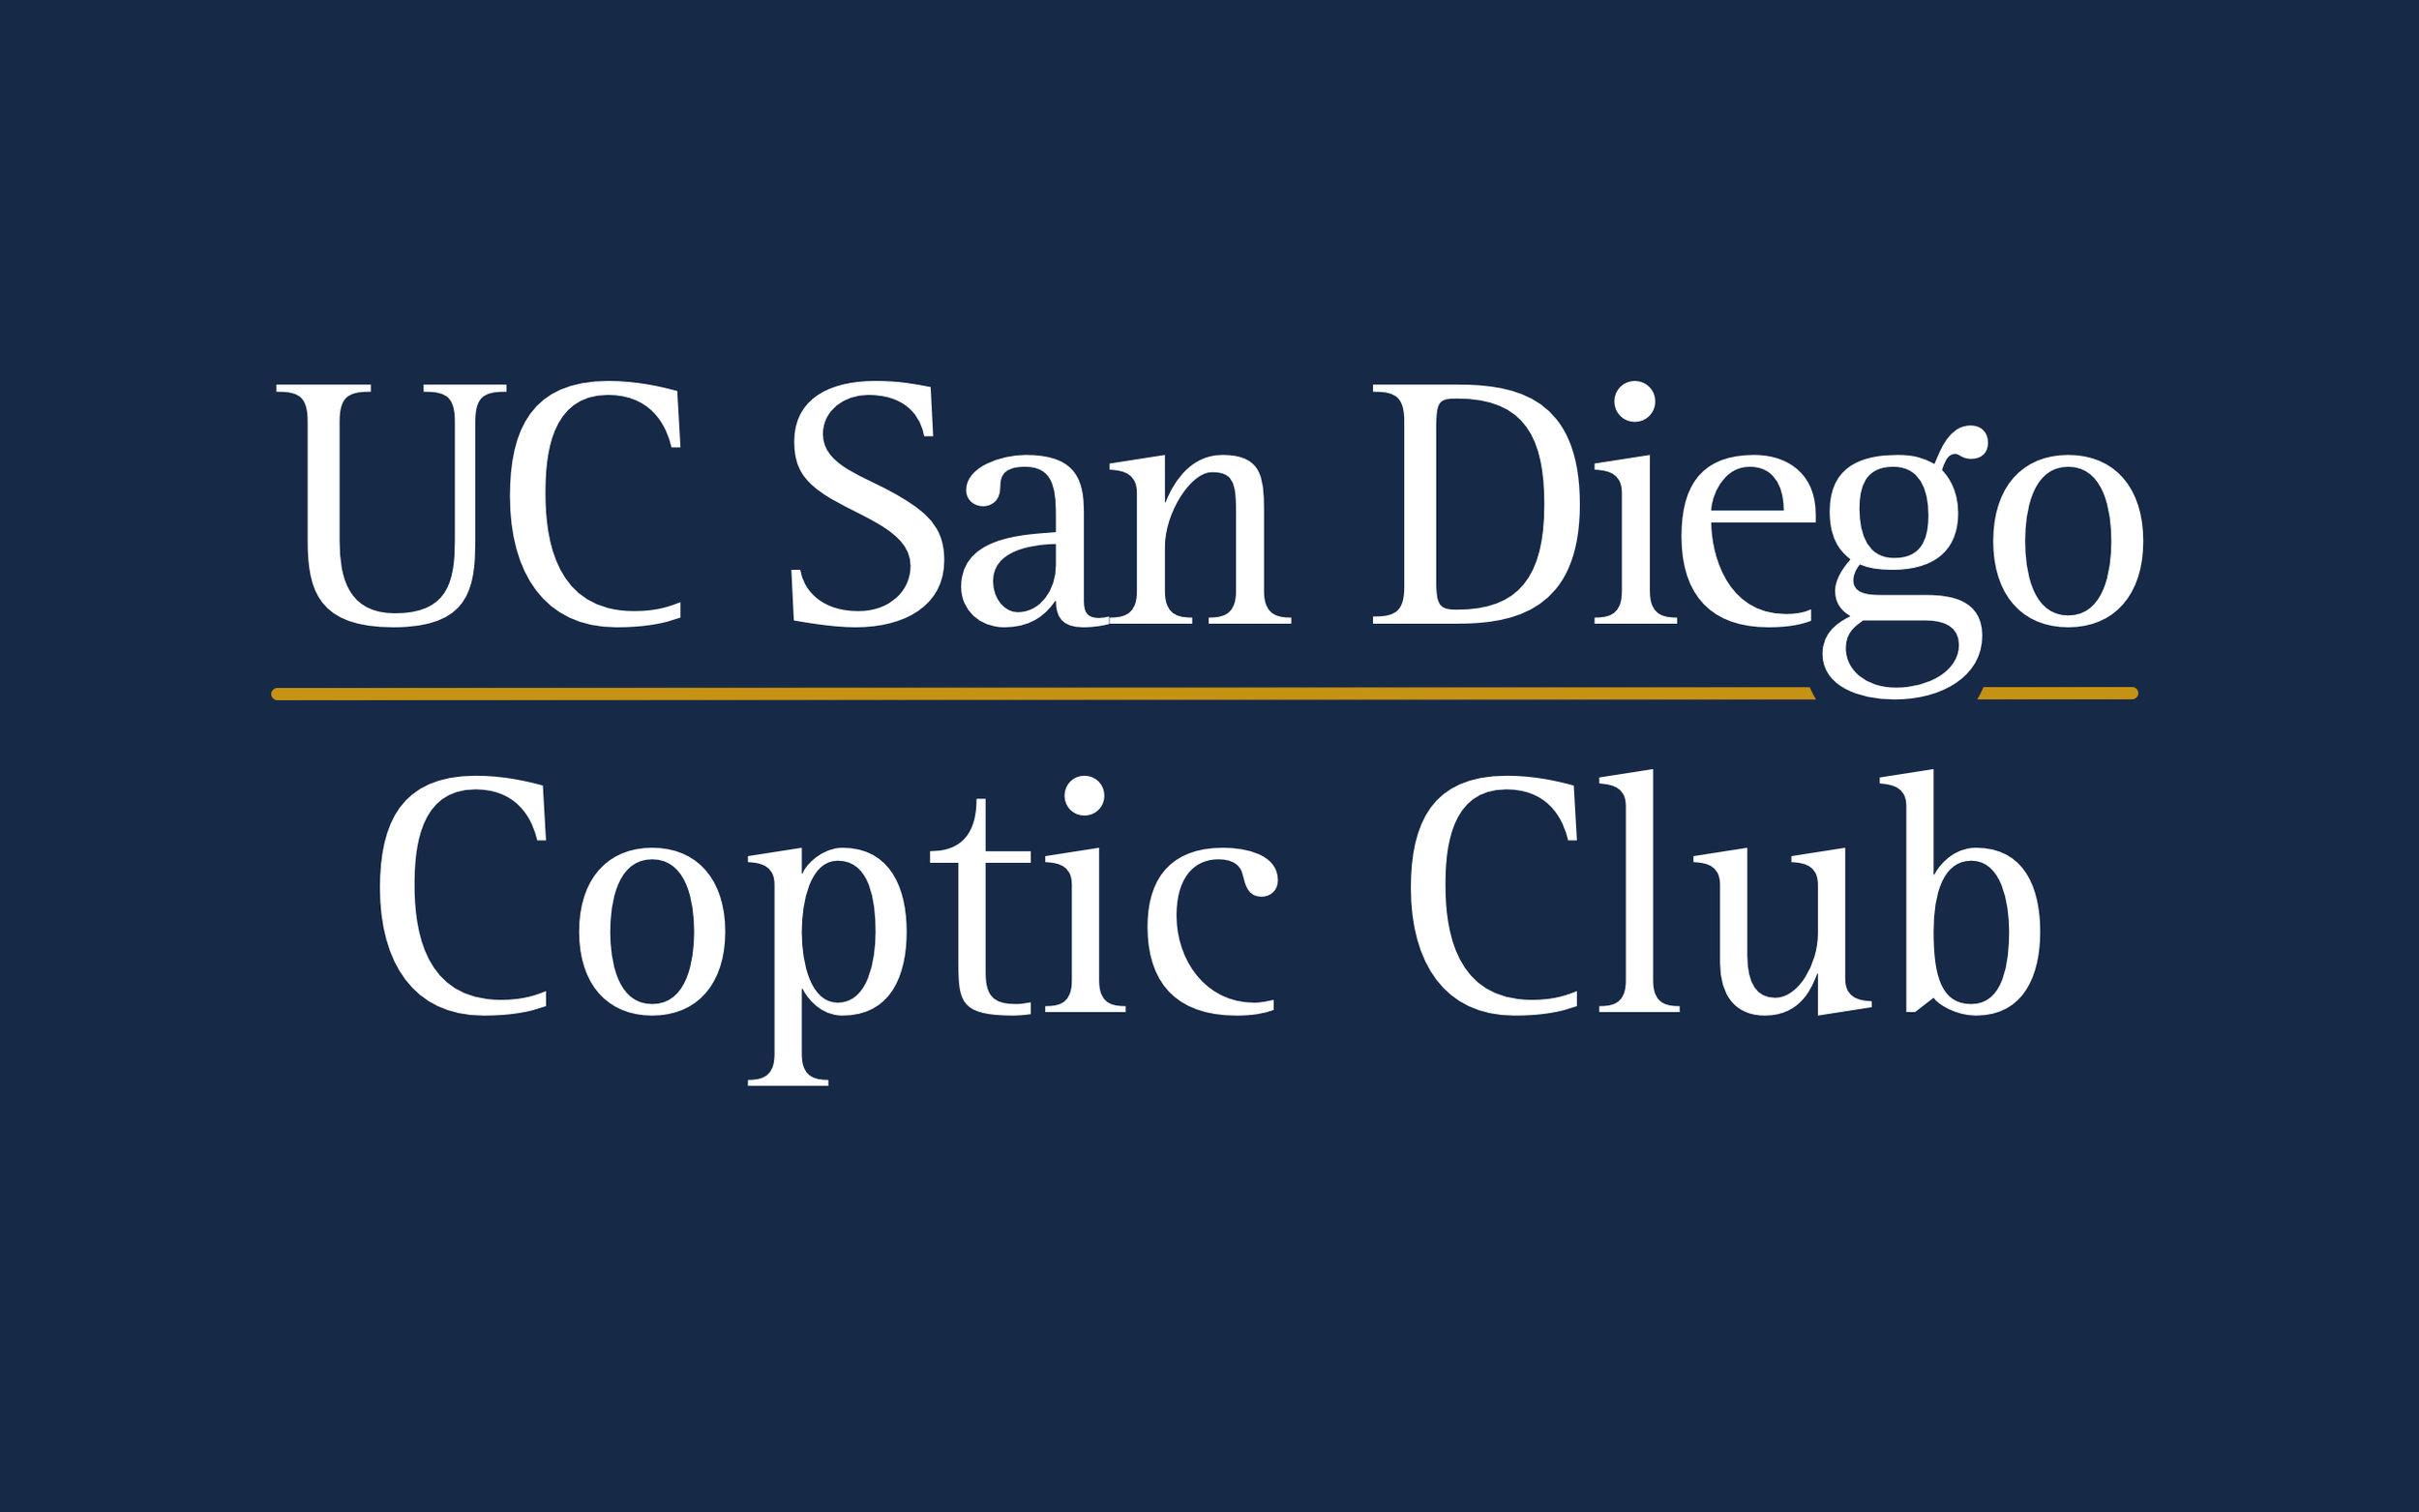 UCSD Coptic Club.jpg